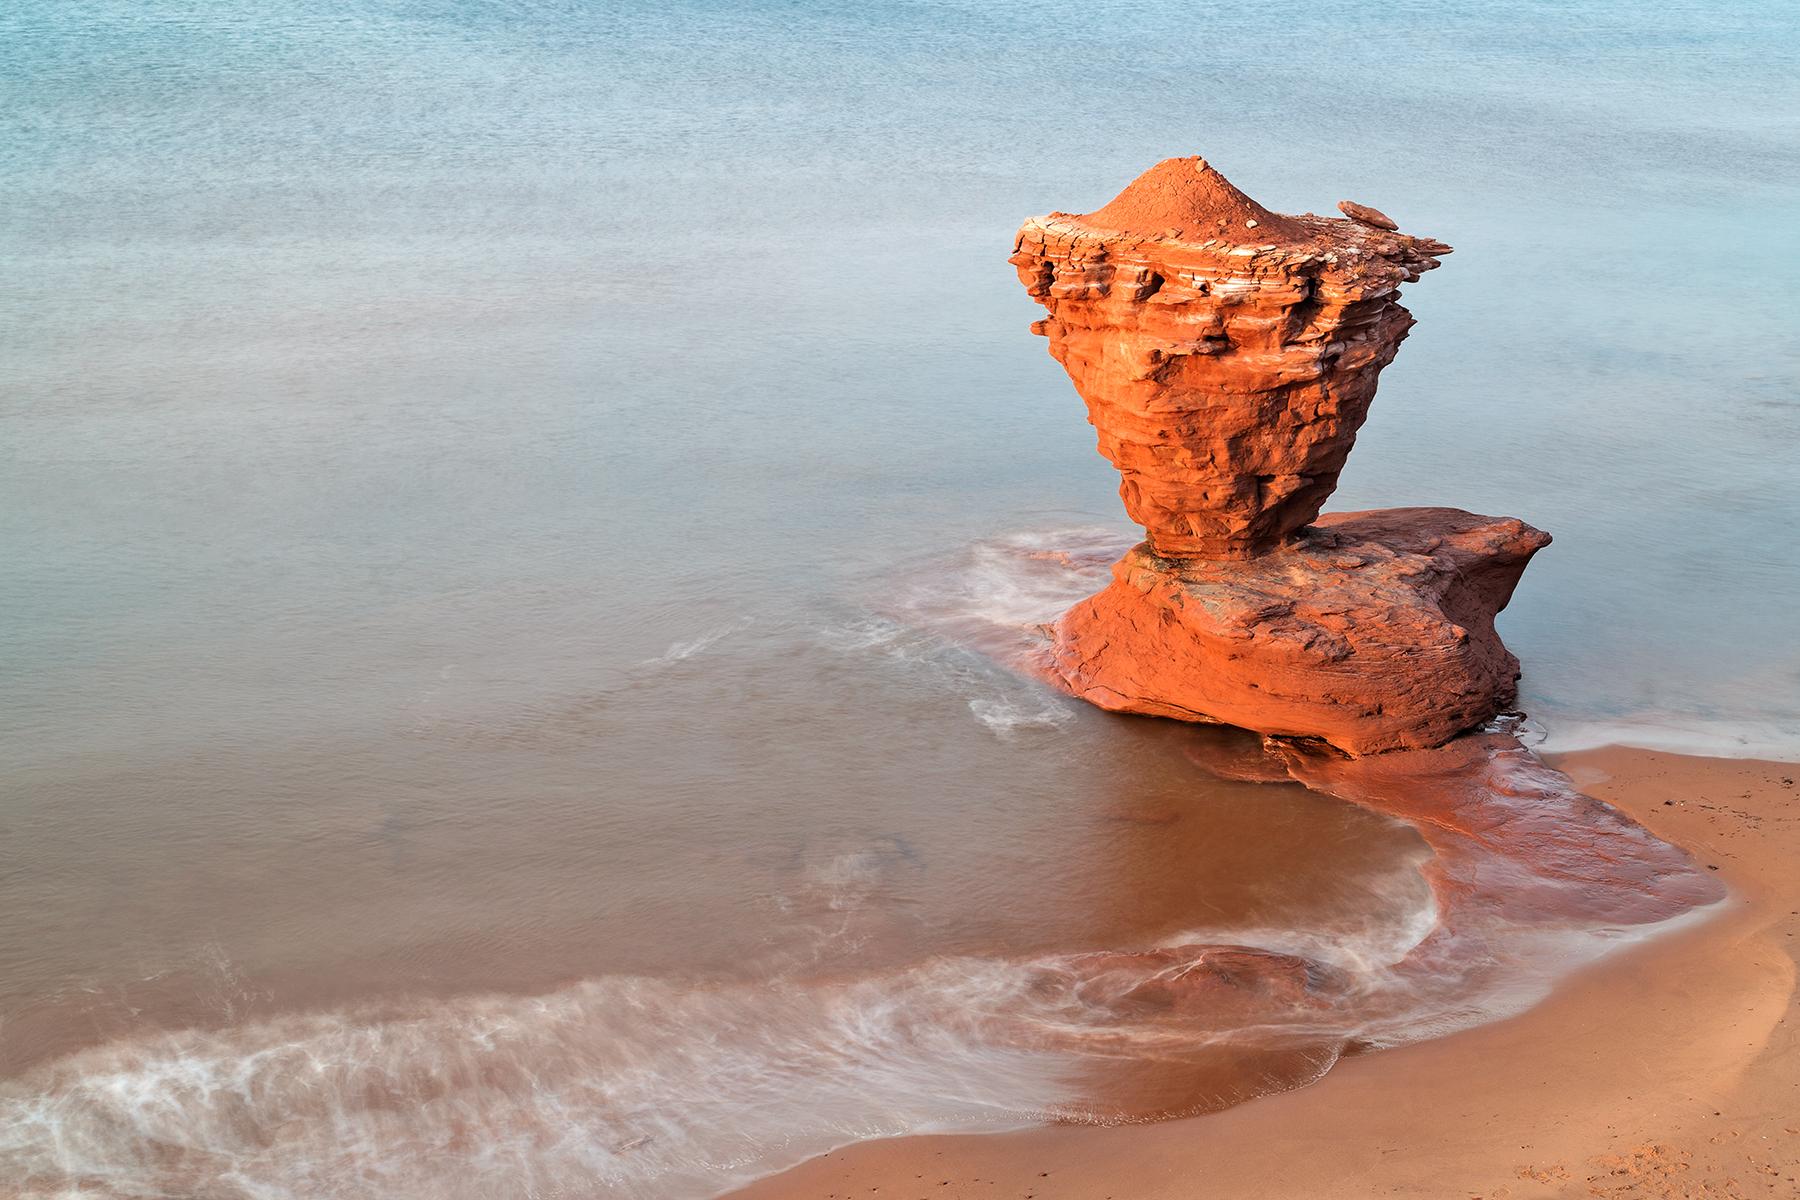 Teapot Rock, Atlantic, Pretty, Scenery, Scene, HQ Photo